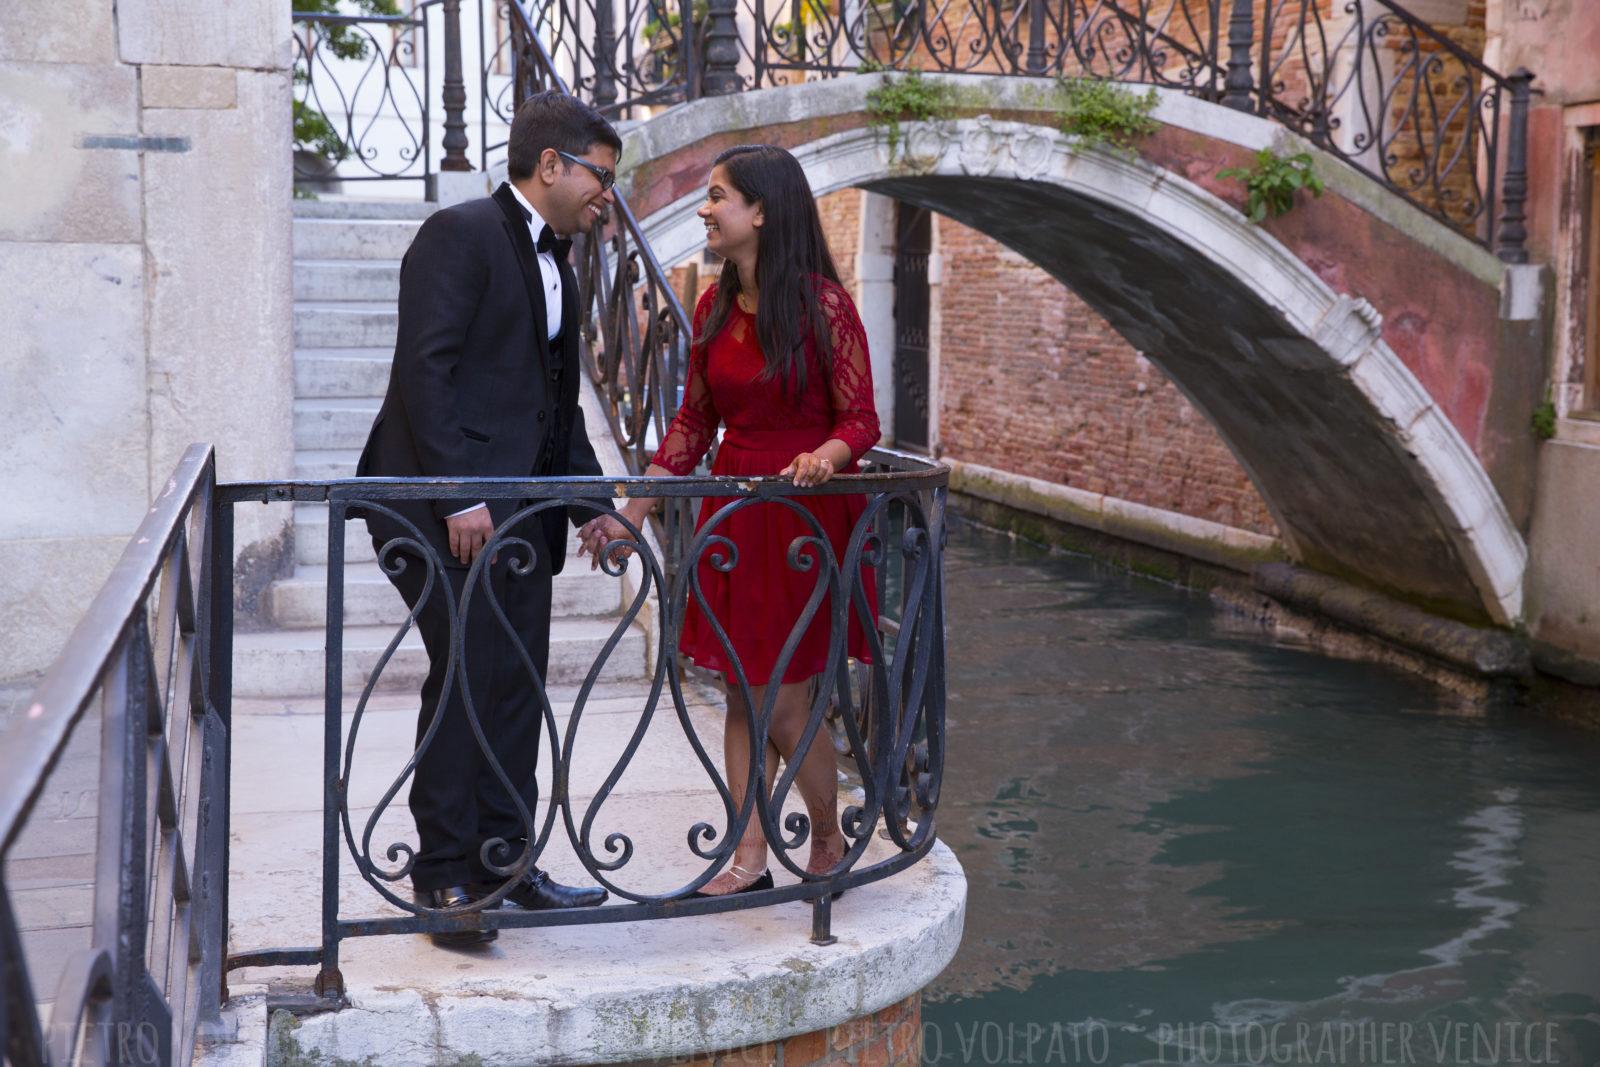 photographer-venice-italy-honeymoon-photo-shoot-romantic-fun-walking-tour-20160429_04